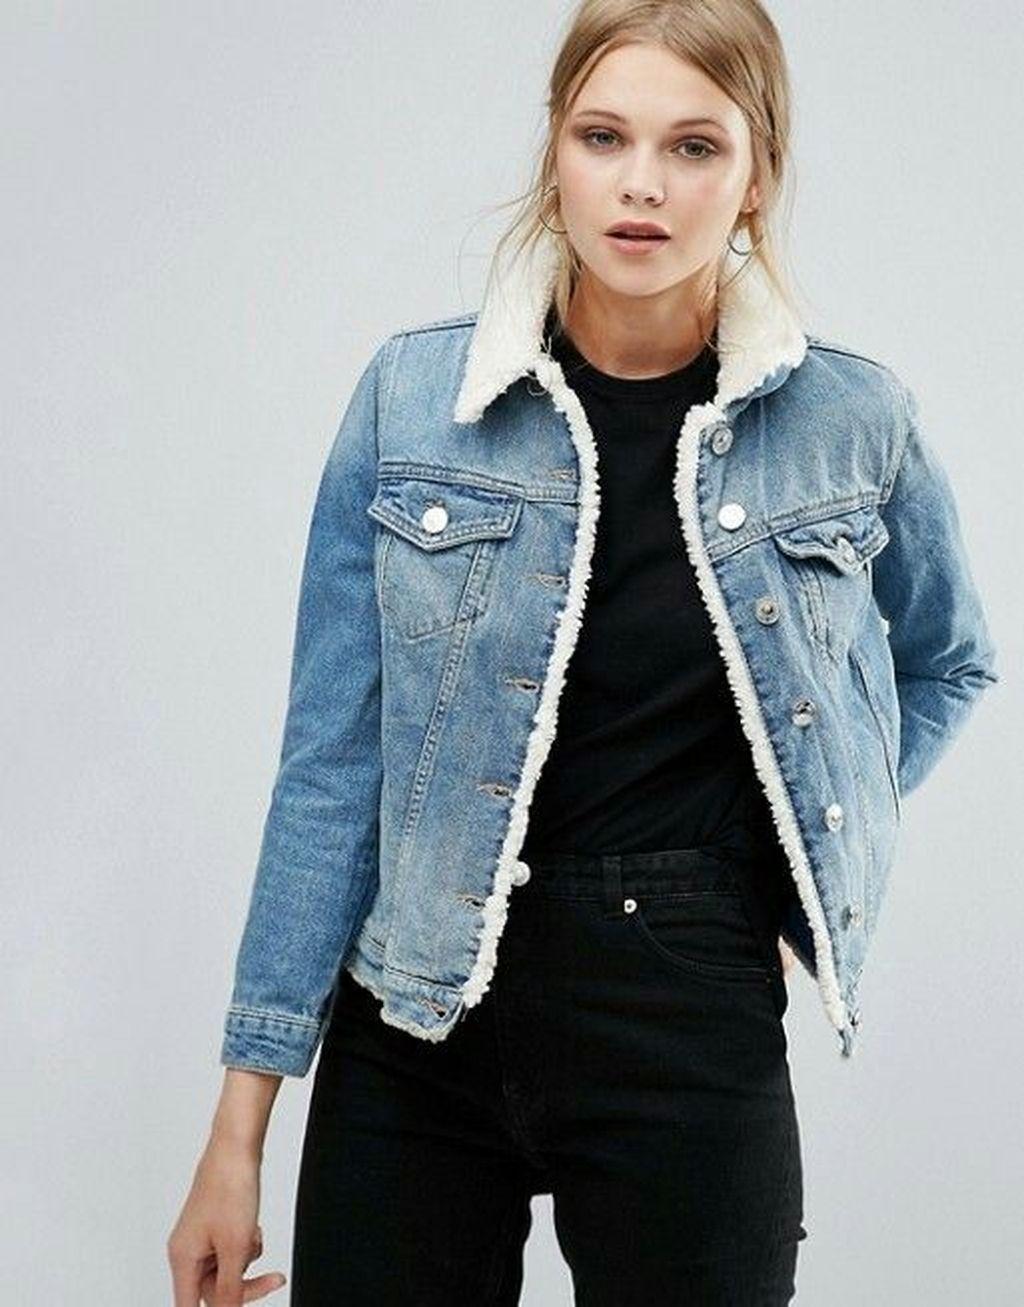 37 Delightful Winter Outfits Ideas Denim Jacket Addicfashion Denim Jacket Women Denim Women Denim Jacket With Fur [ 1307 x 1024 Pixel ]